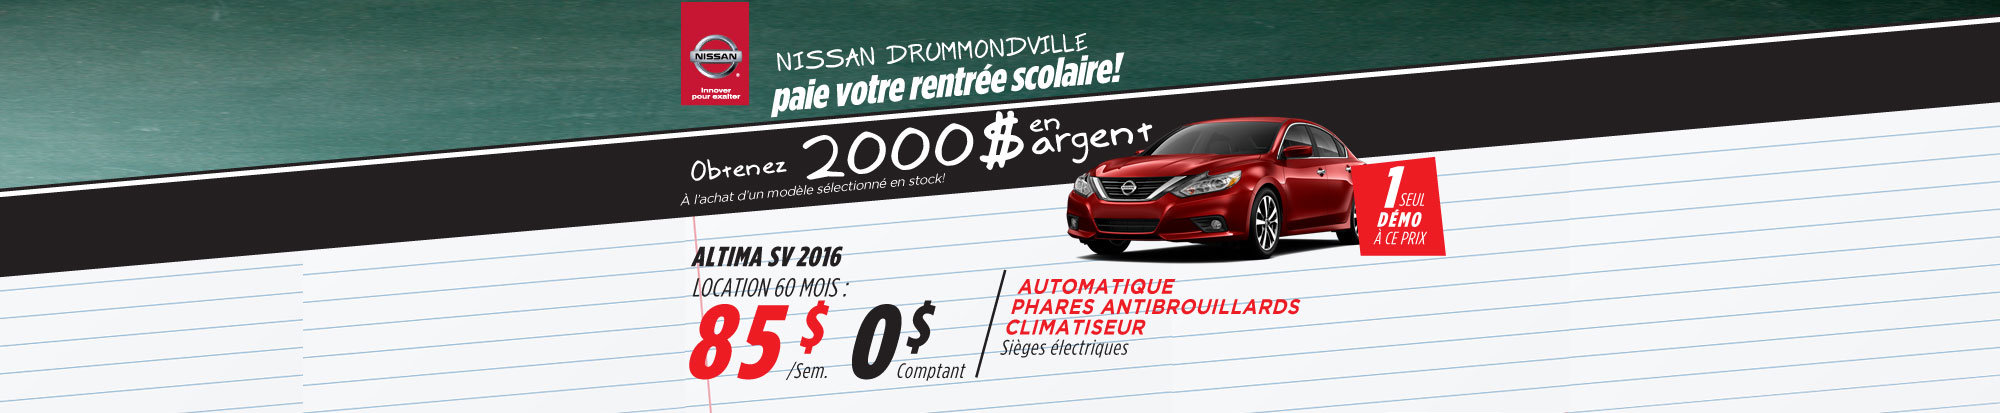 La liquidation top chrono de Nissan: Altima 2016 Drummondville